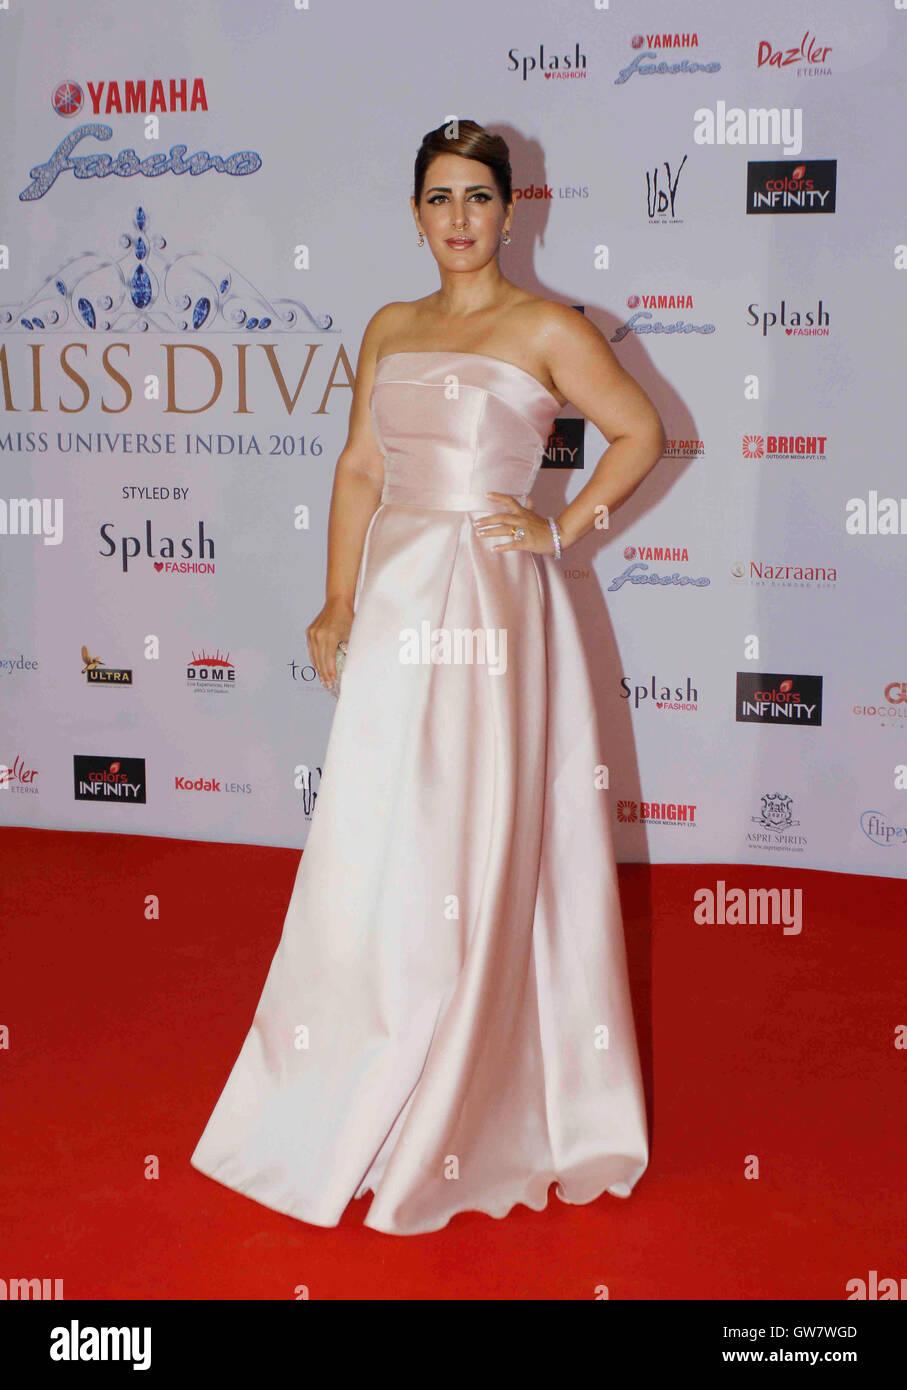 Fashion Designer Pria Kataaria Puri During The Grand Finale Of Yamaha Stock Photo 118802333 Alamy